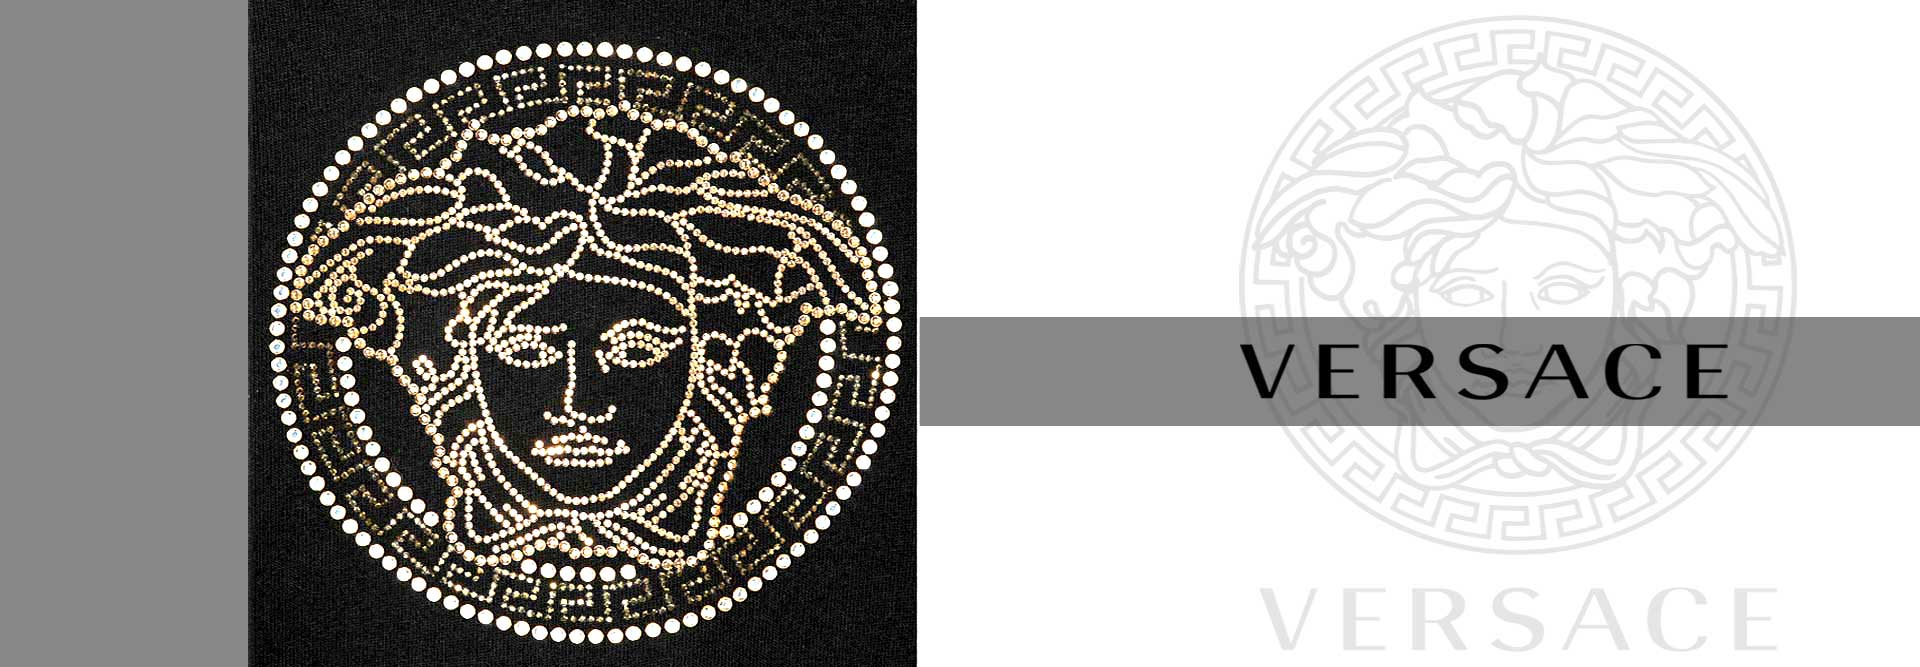 versace sh9 1 - جیانی ورساچه versace